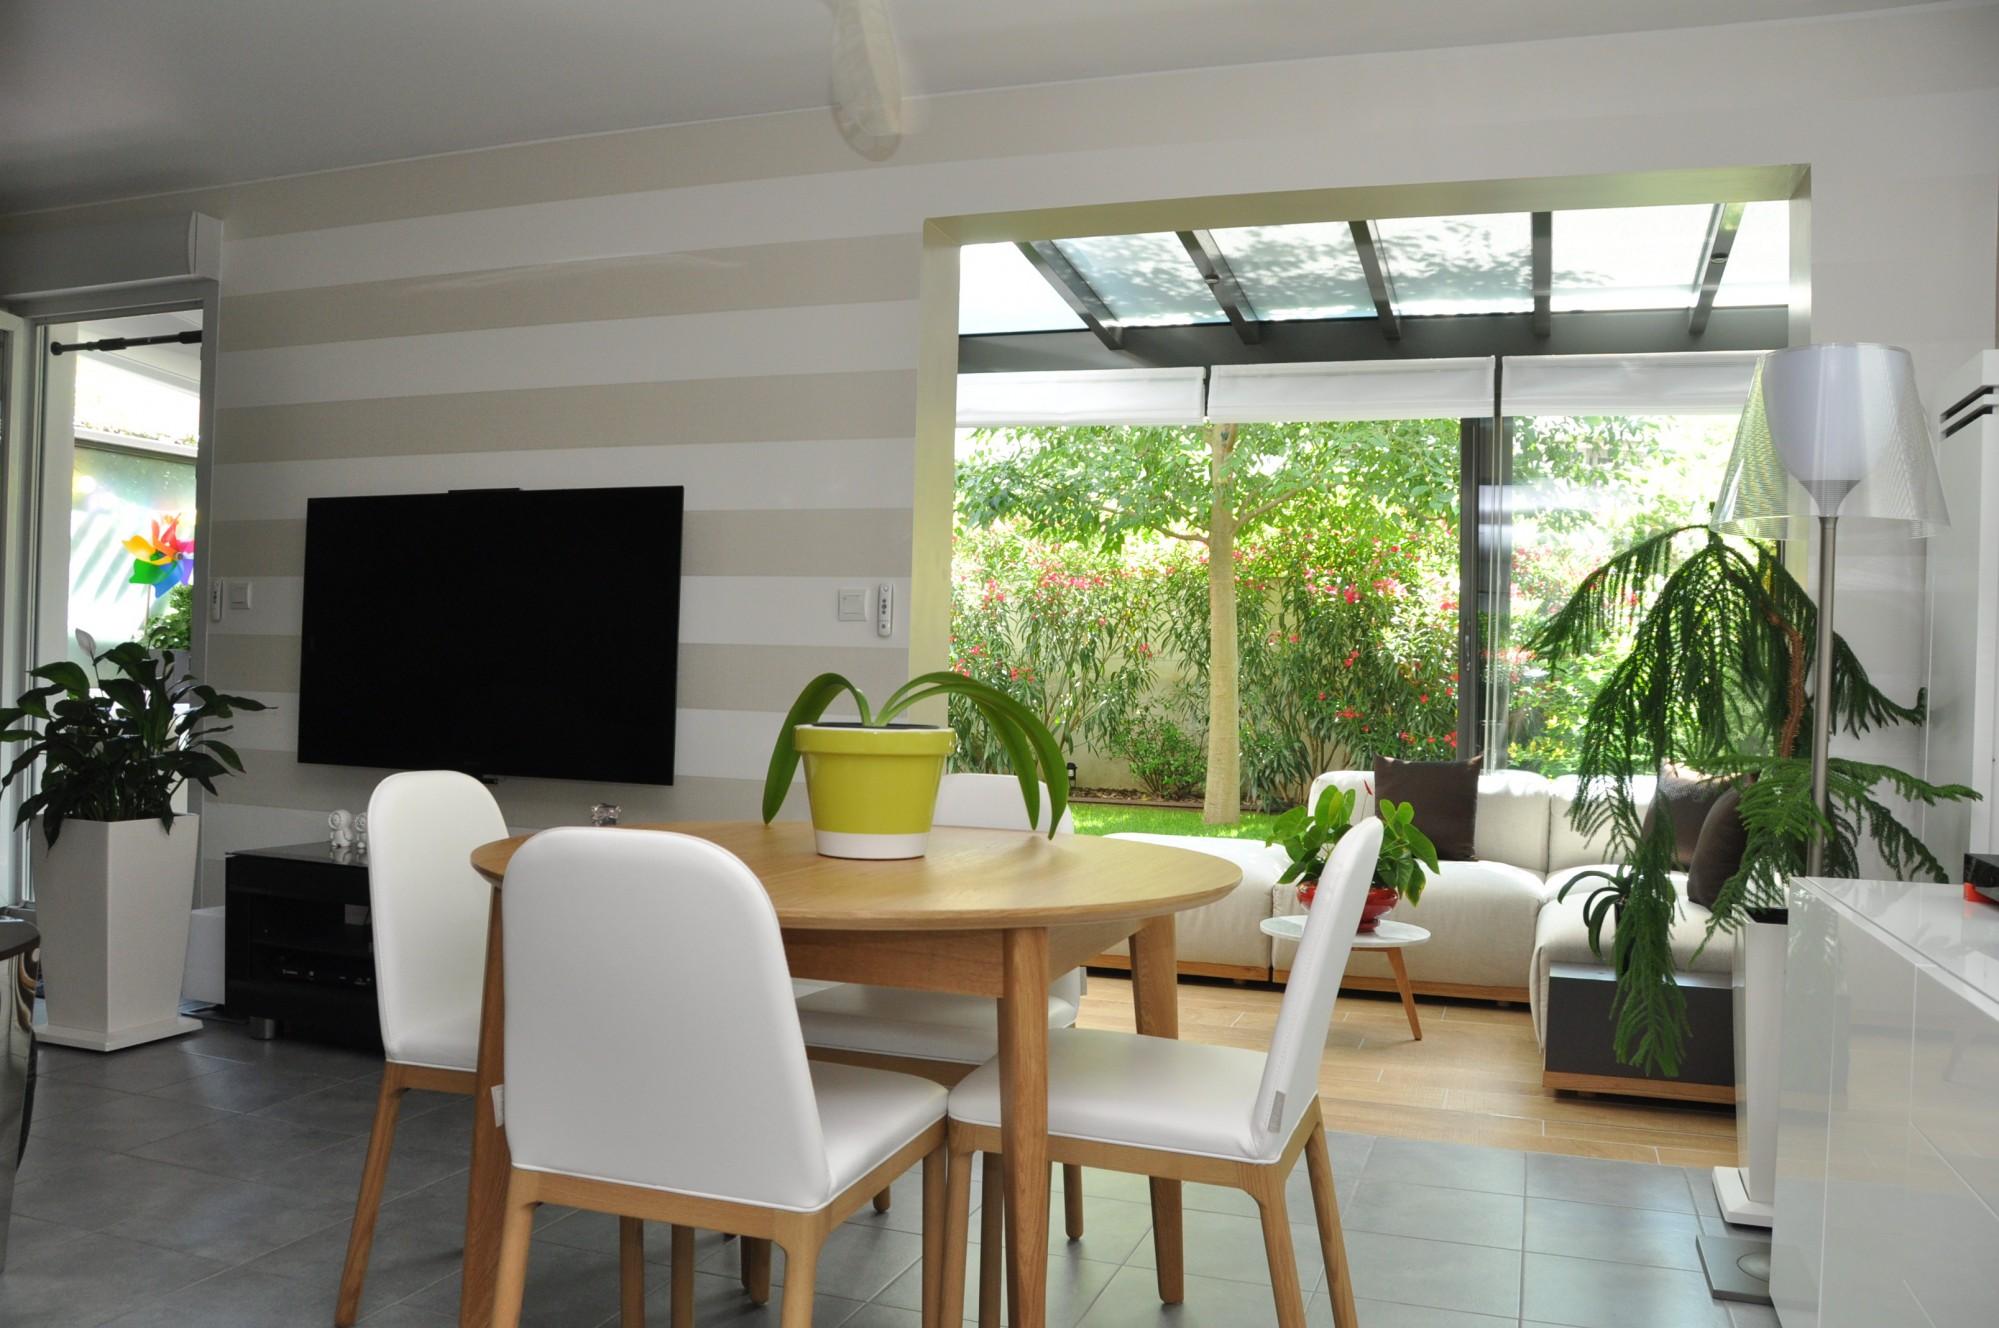 v randa extension en aluminium lyon perspective v randa. Black Bedroom Furniture Sets. Home Design Ideas